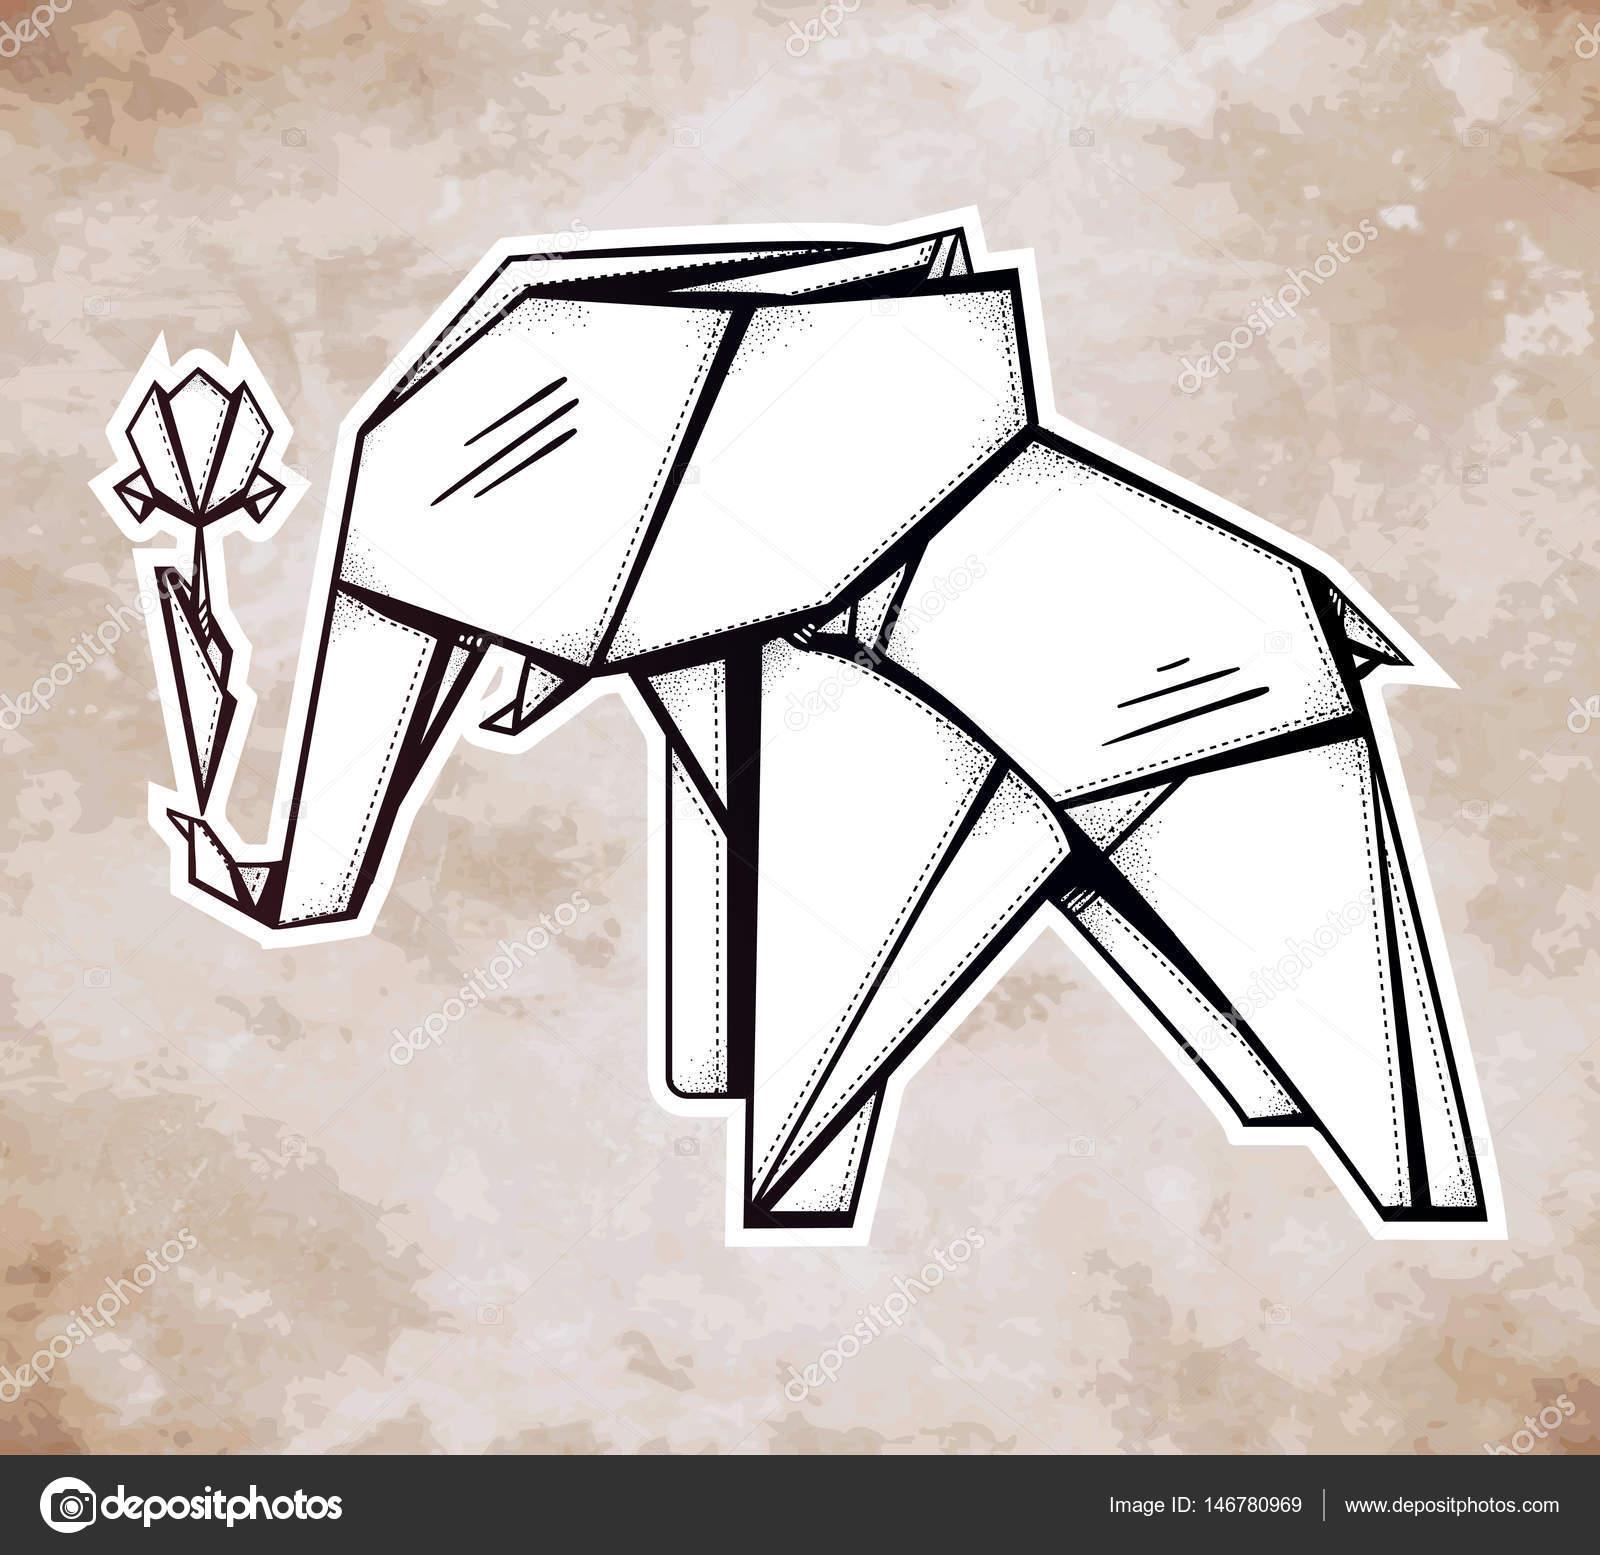 Geometric pattern origami elephant with flower stock vector geometric pattern origami elephant holding a flower stylized triangle polygonal model tattoo spirituality boho design use for print posters jeuxipadfo Choice Image